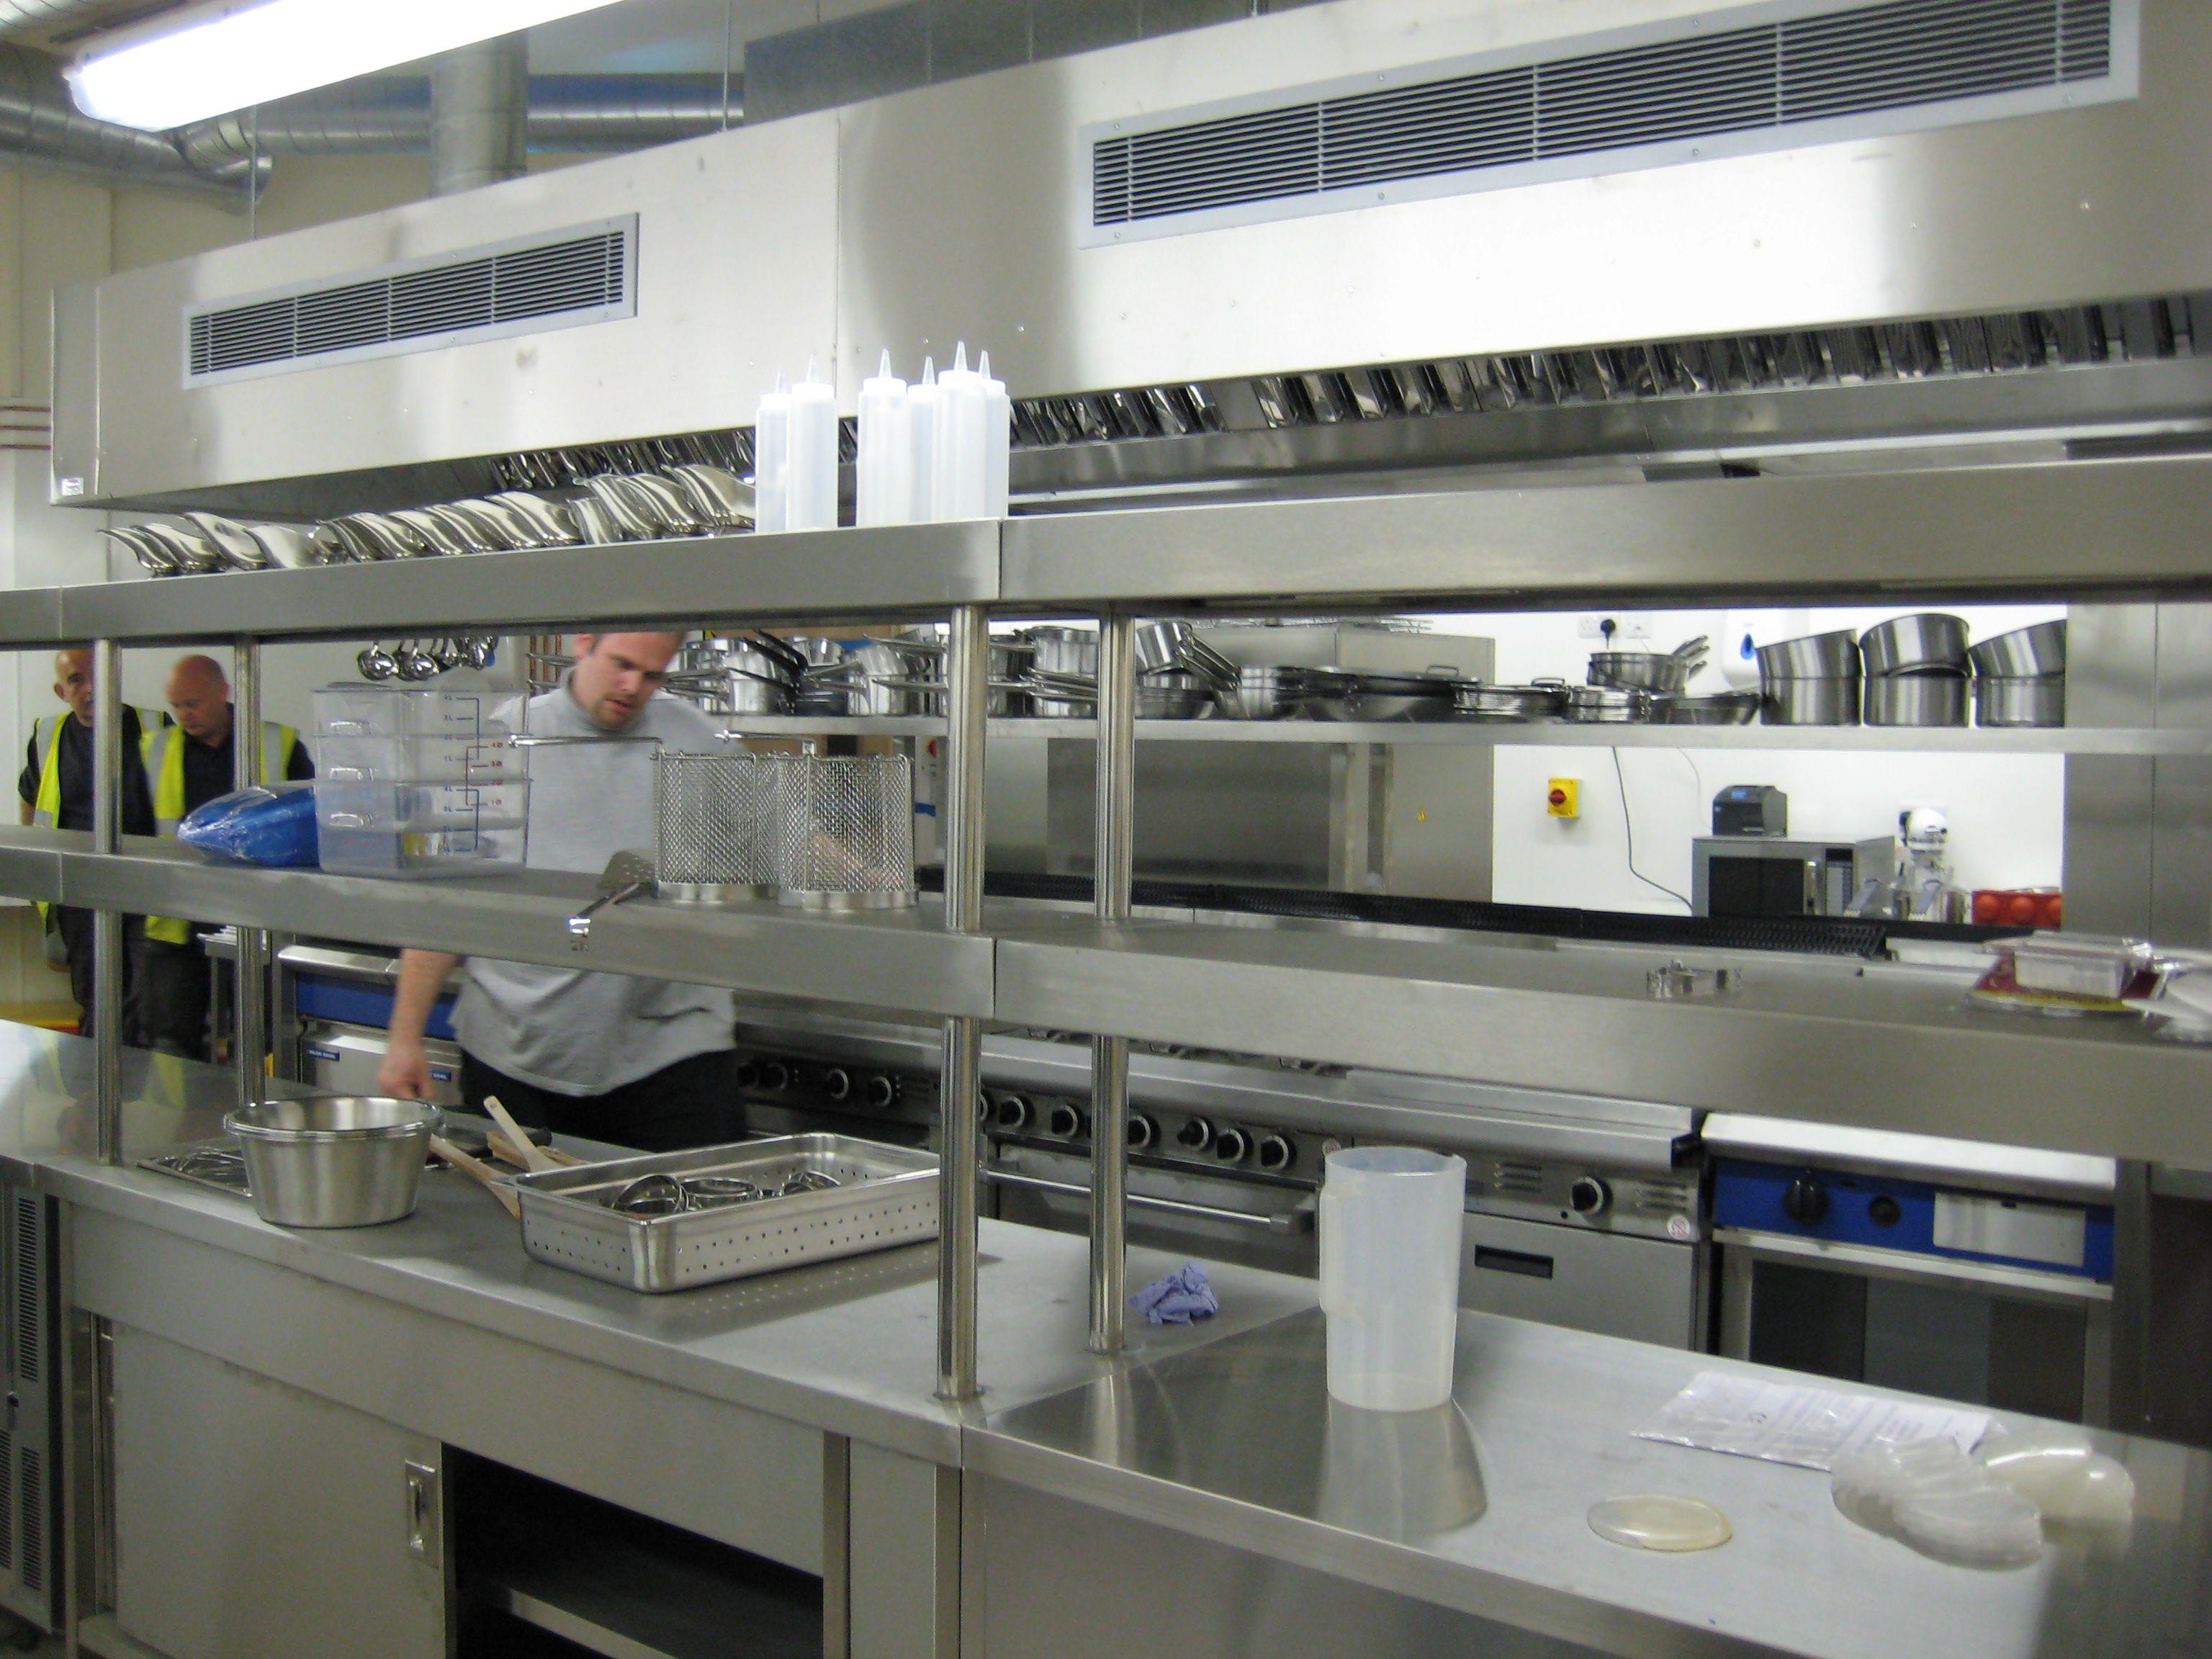 used craigslist san restaurant kitchen diego food commercial equipment service